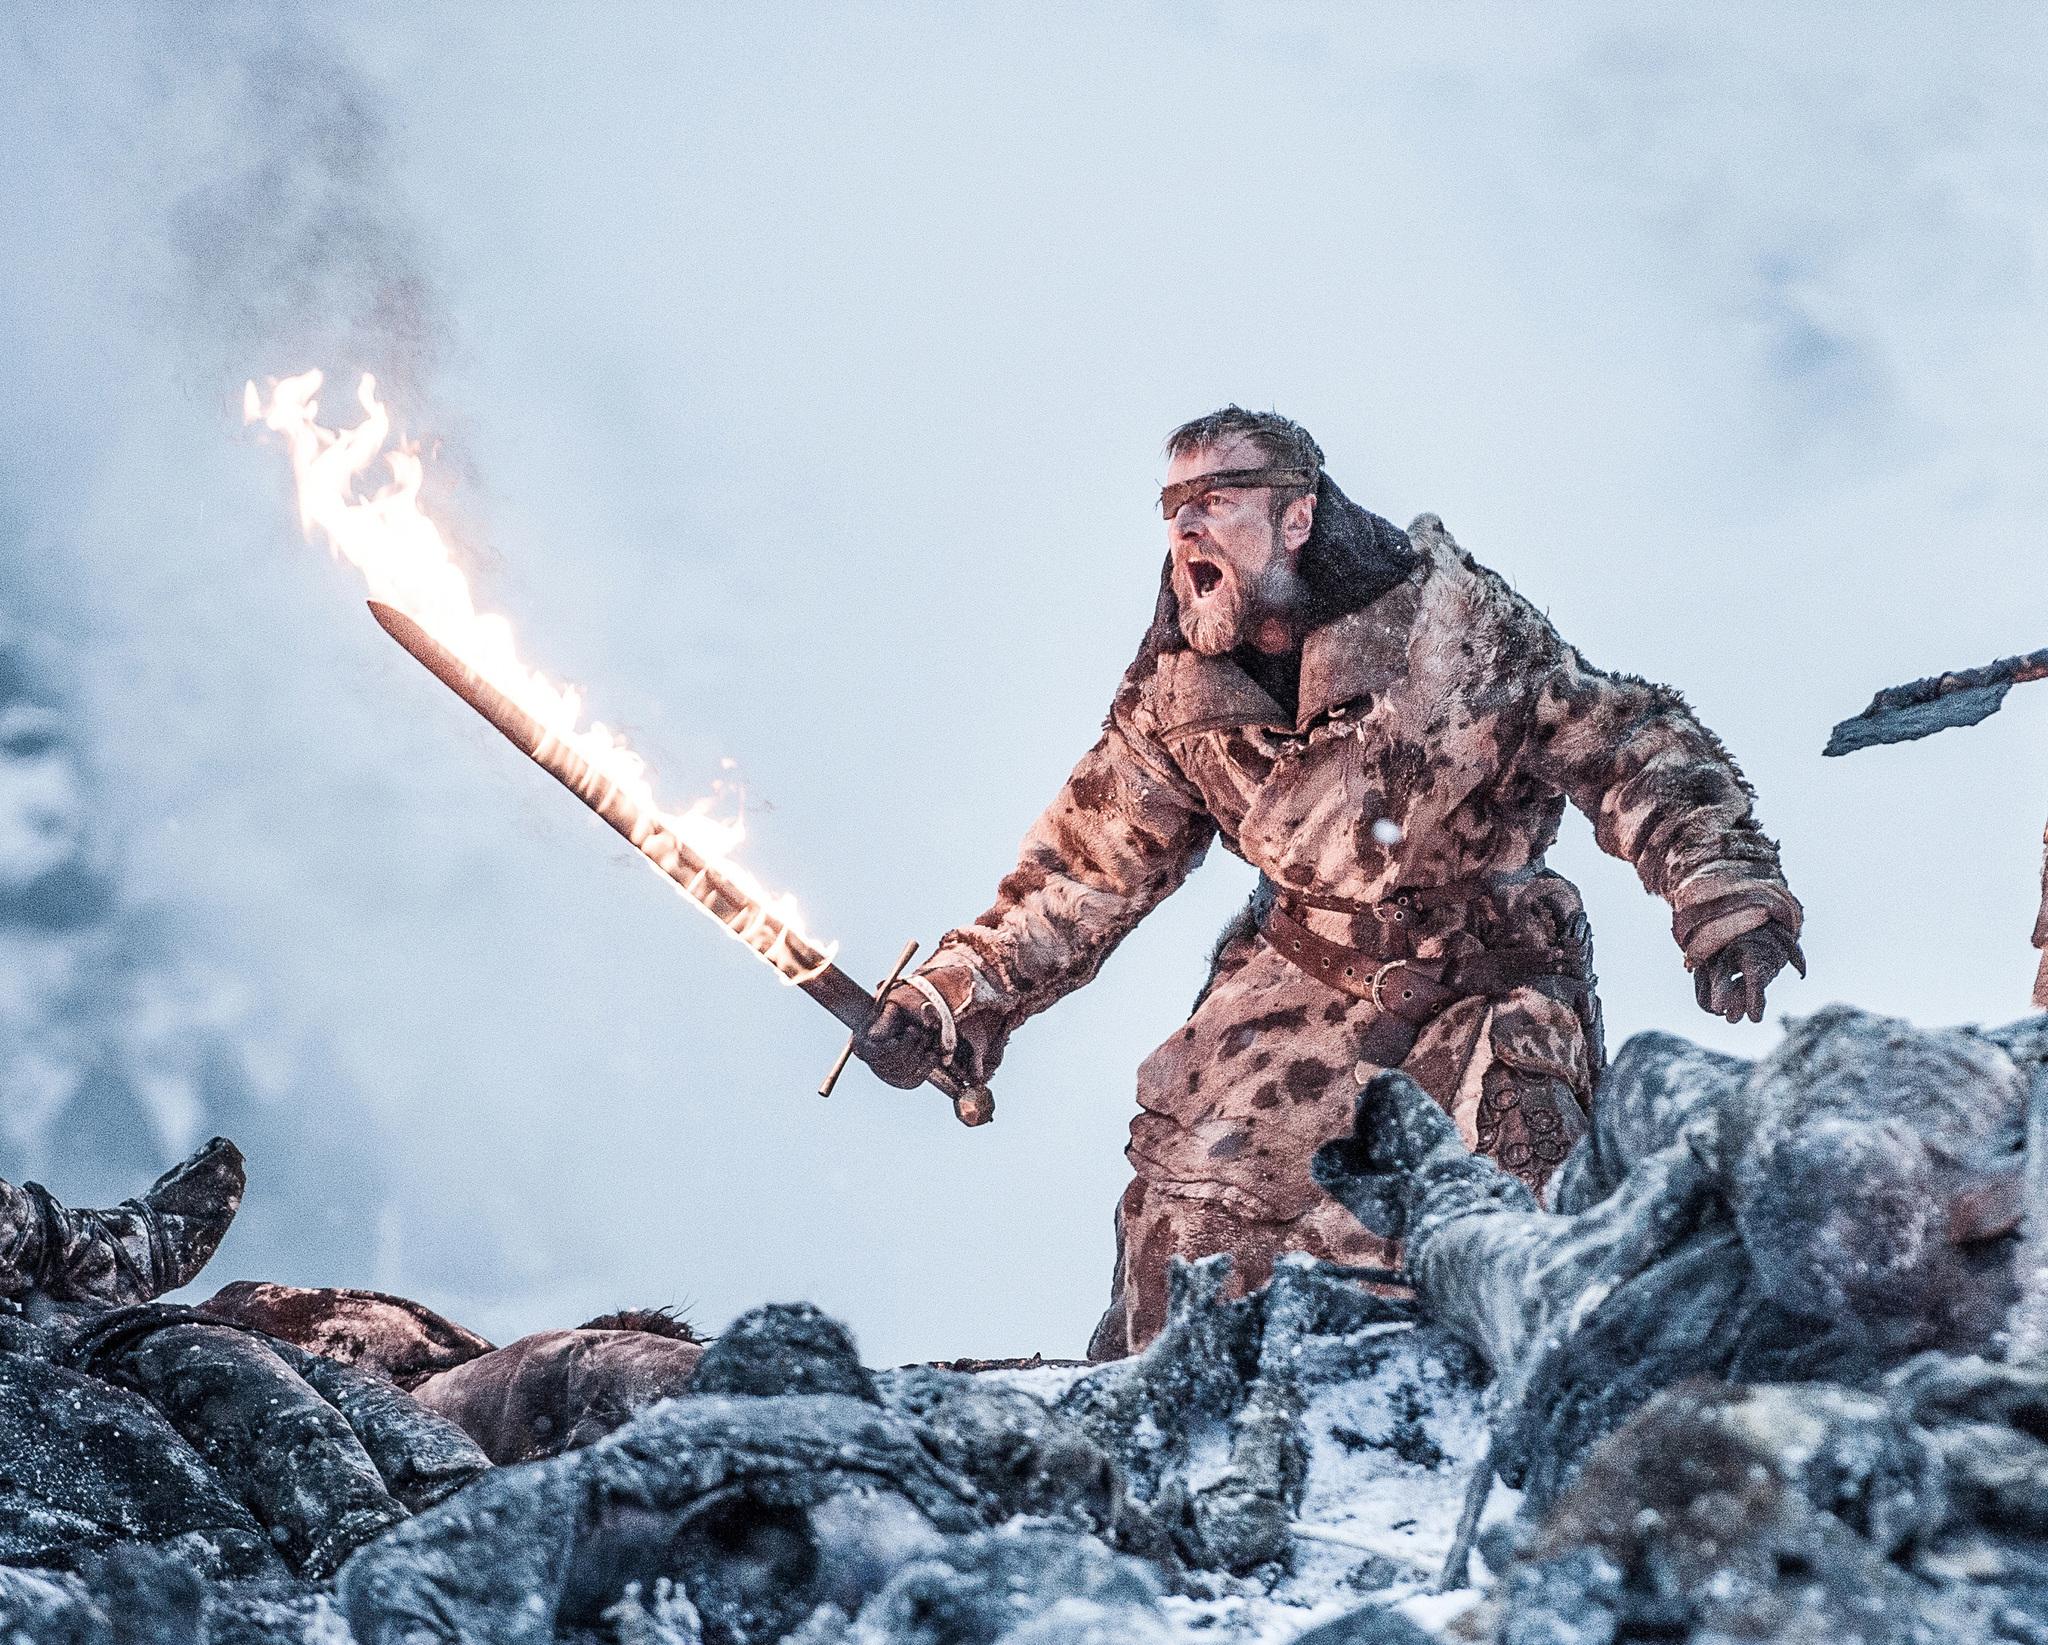 Richard Dormer in Game of Thrones (2011)